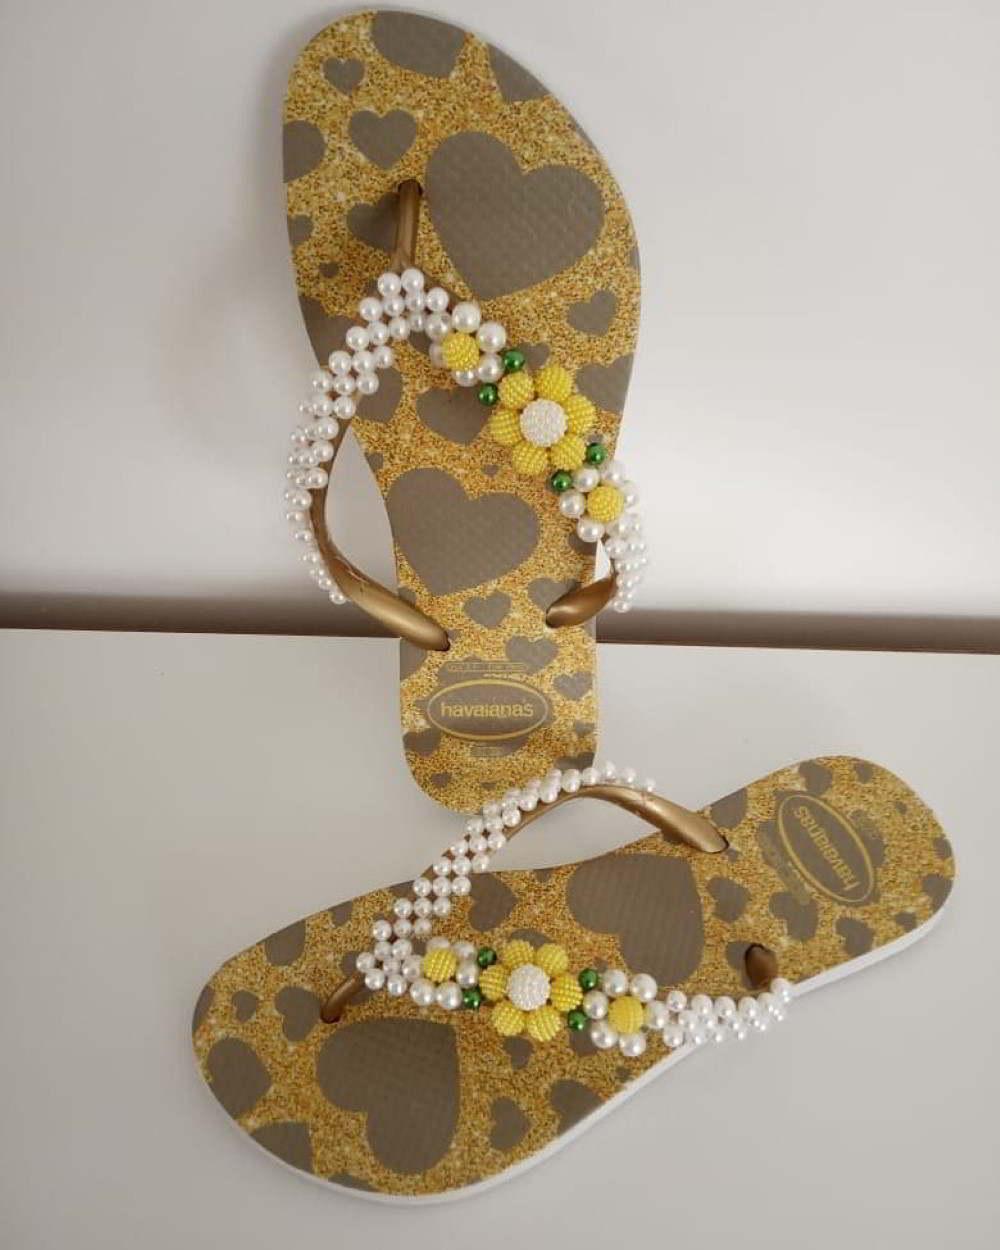 sandalia com corações bordada